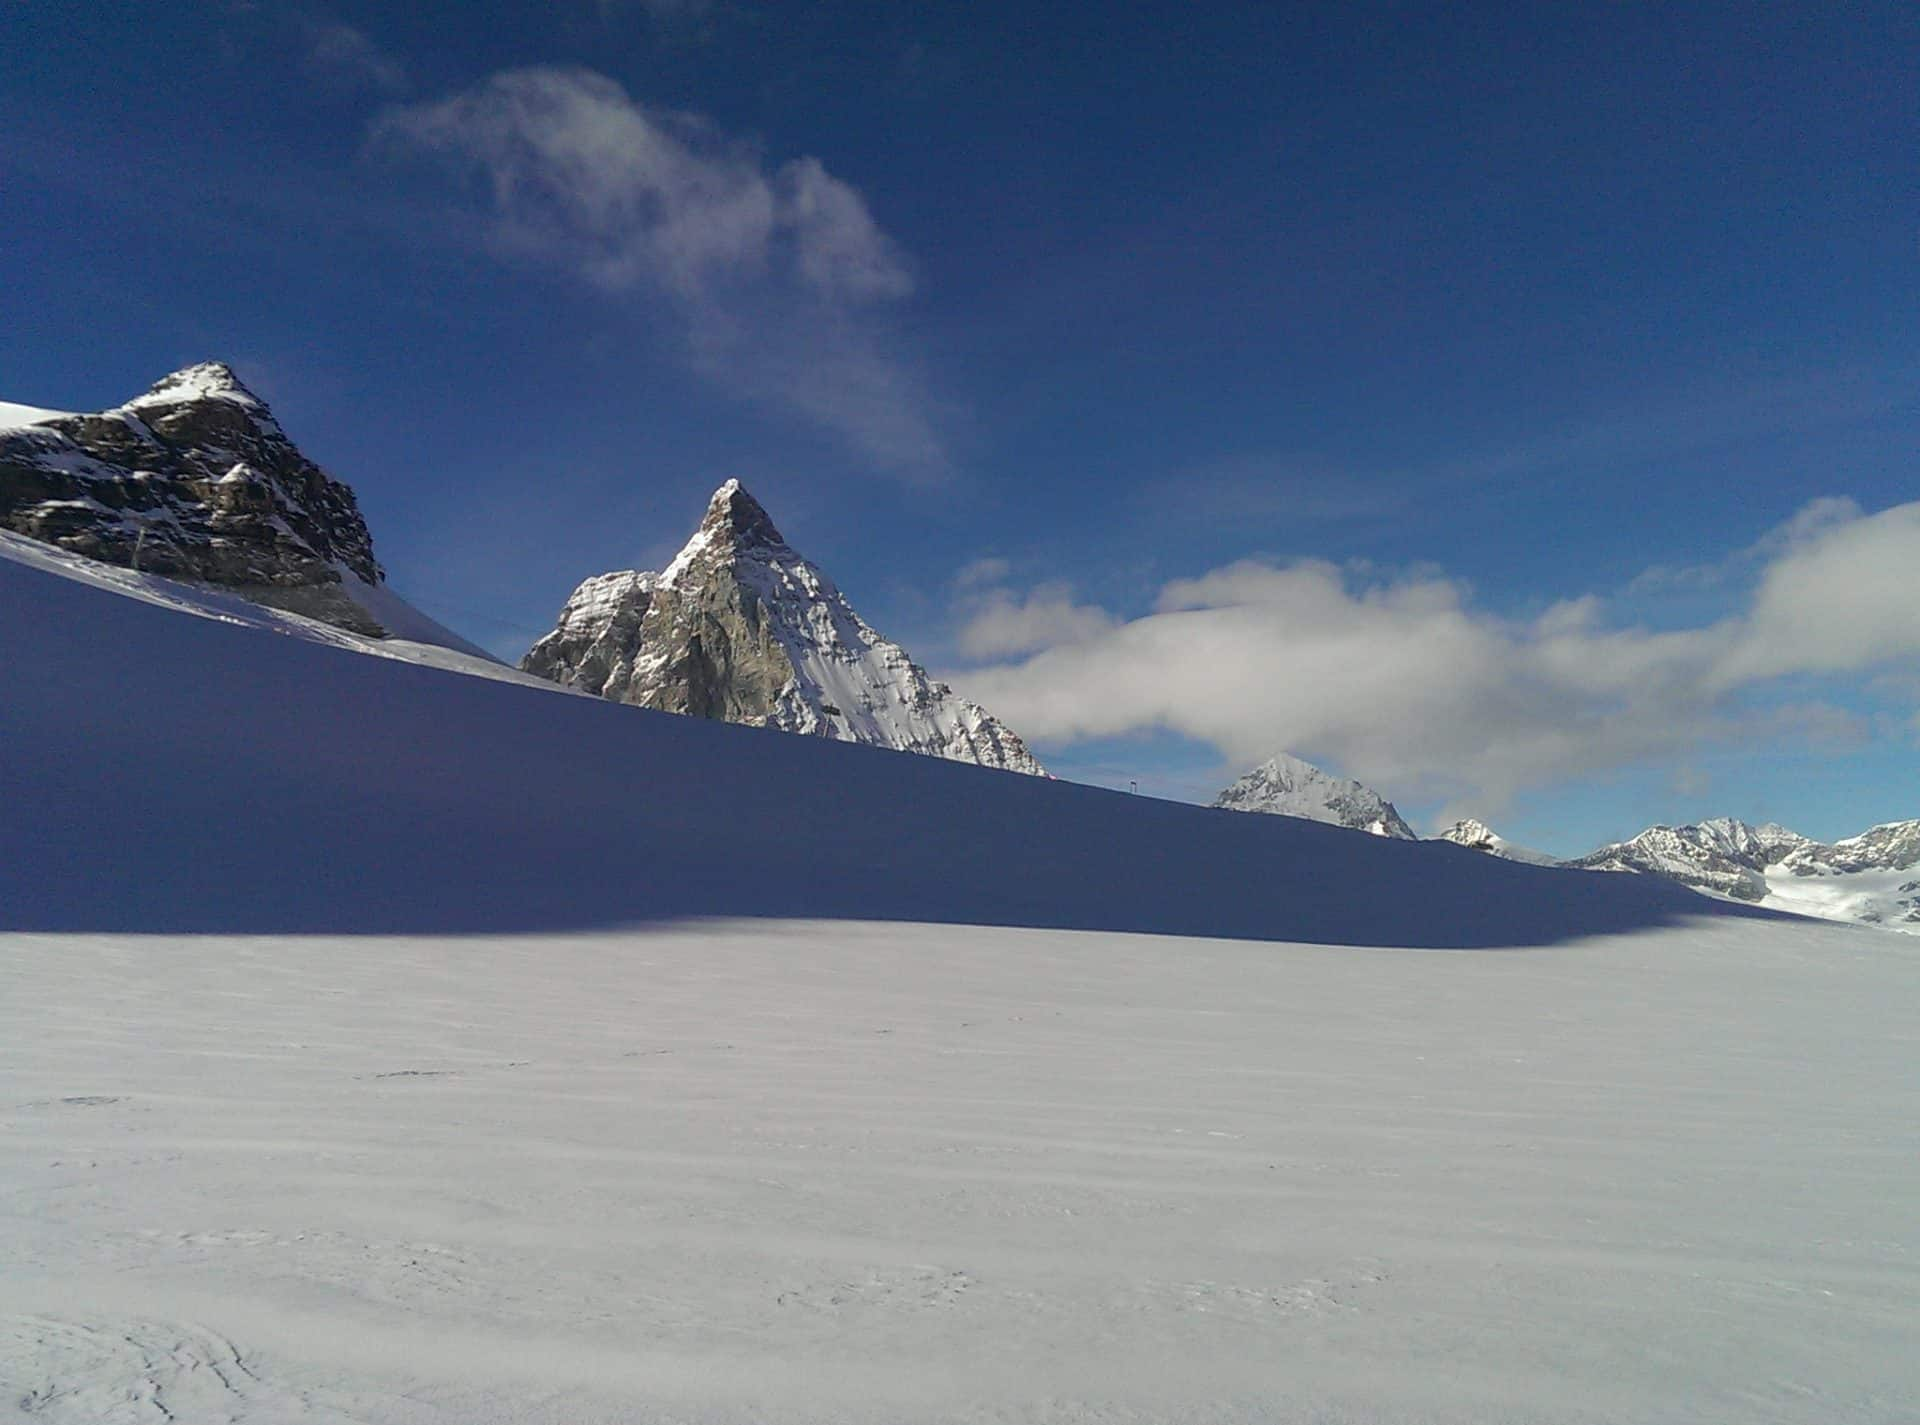 Zermatt 3-day private guided freeride skiing